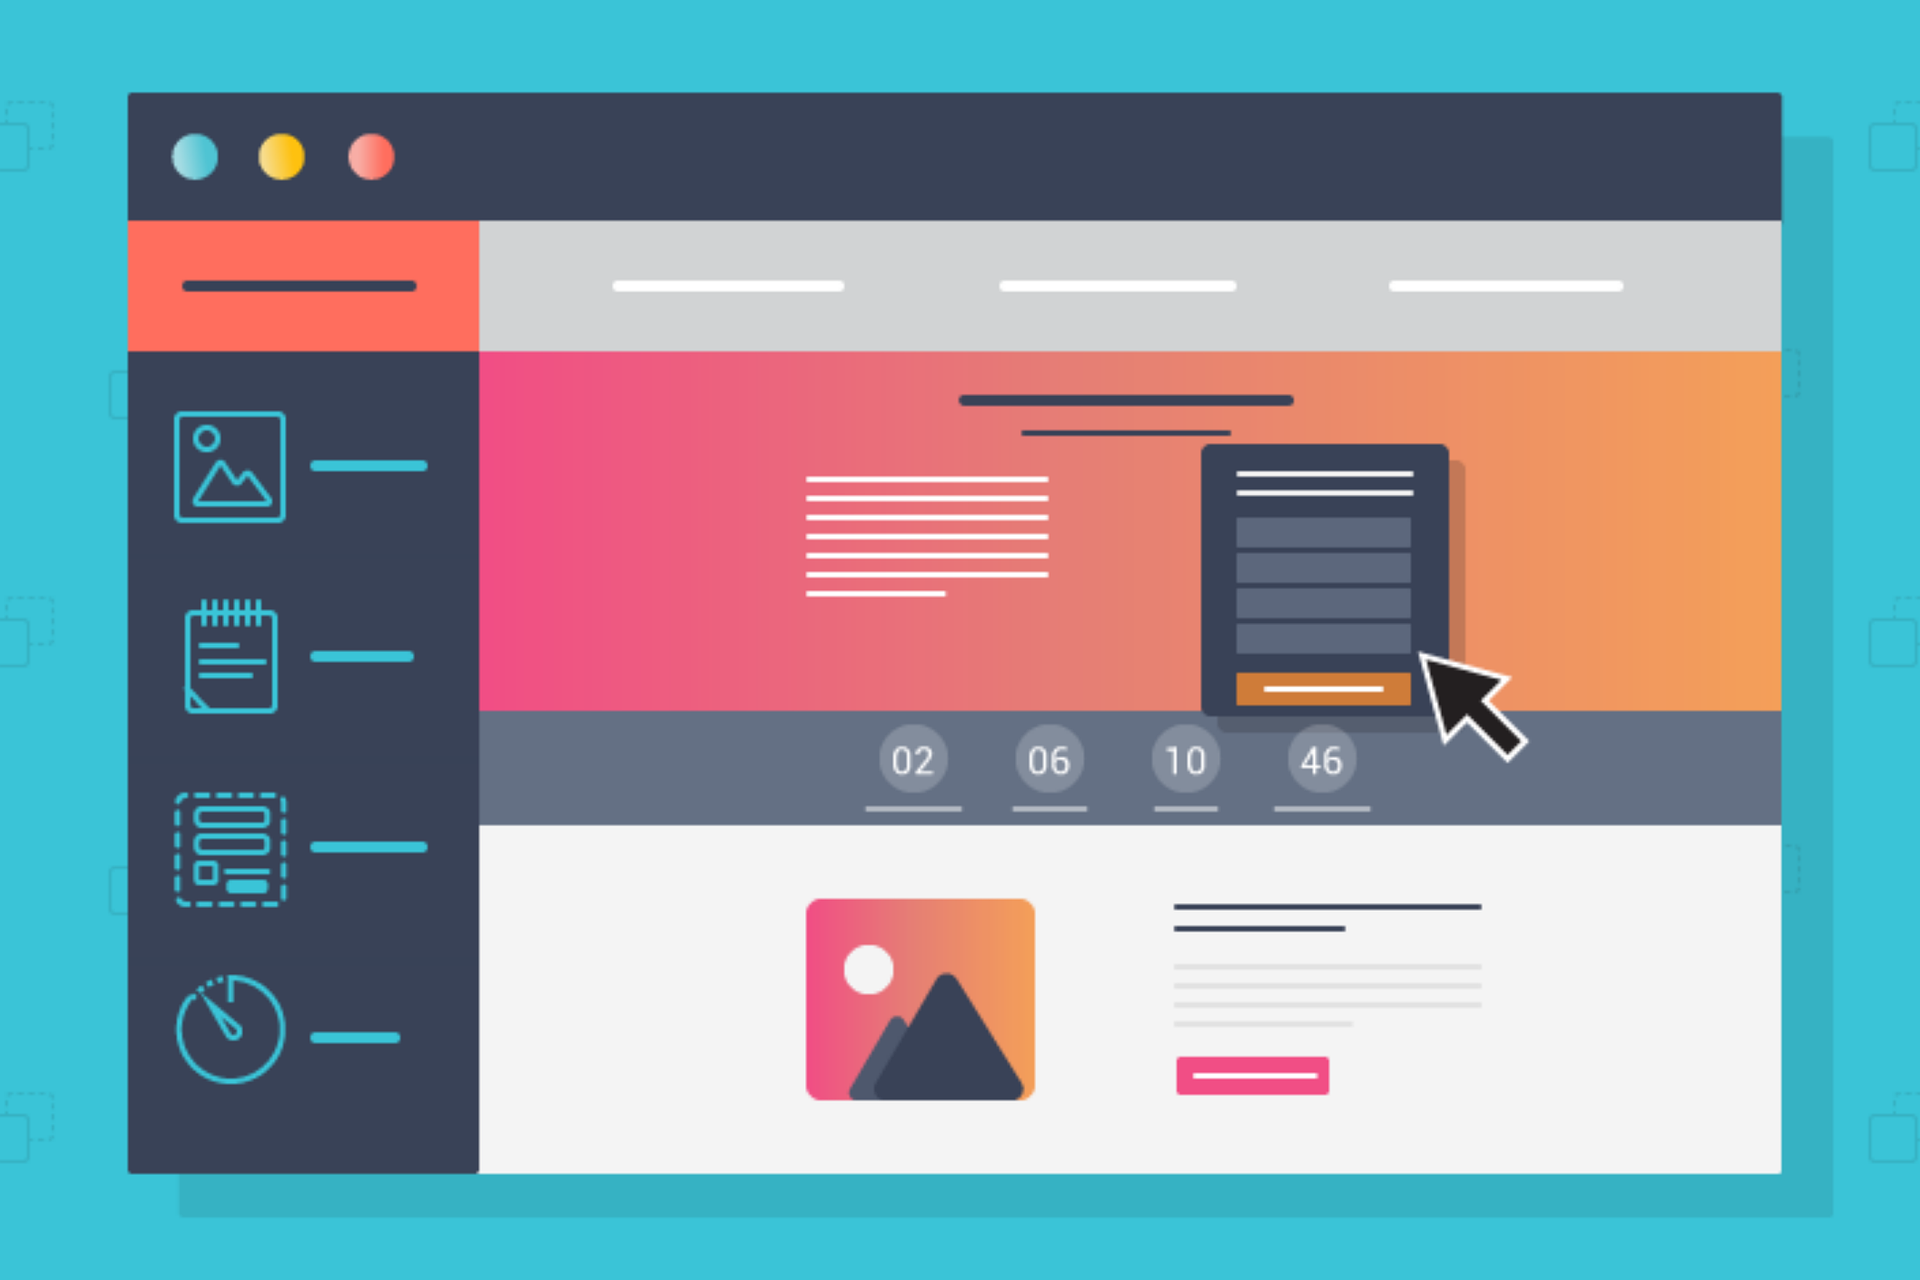 HappyWeb.ro | Web development | Product catalog | Web design, web development, online marketing